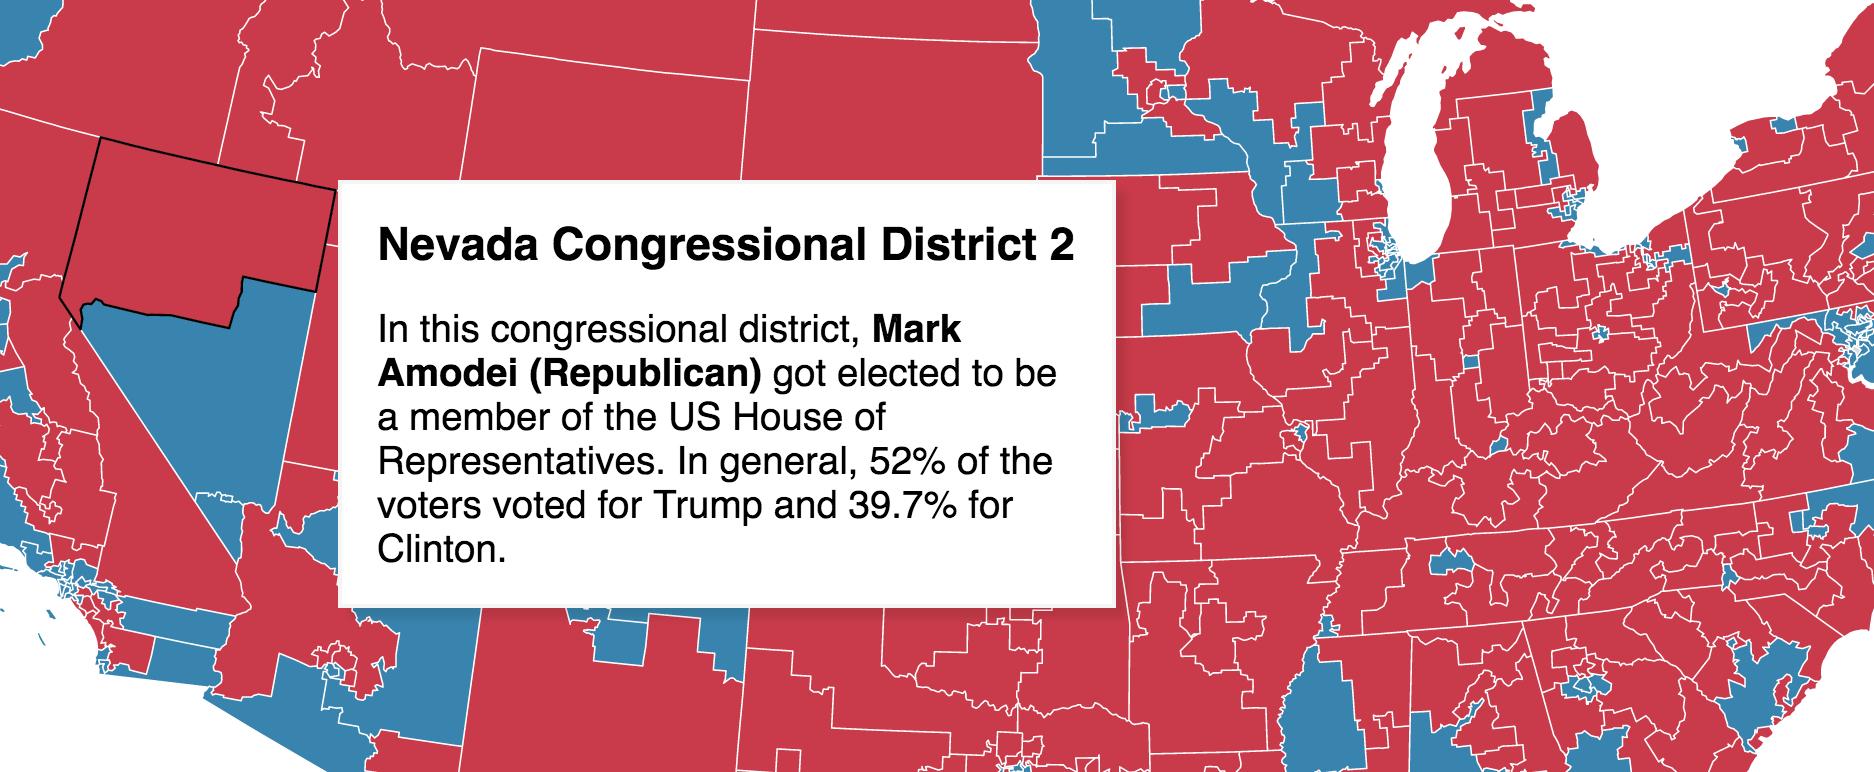 U S House District Map - 16.16.hus-Noorderpad.de • - Texas Us Representative District Map